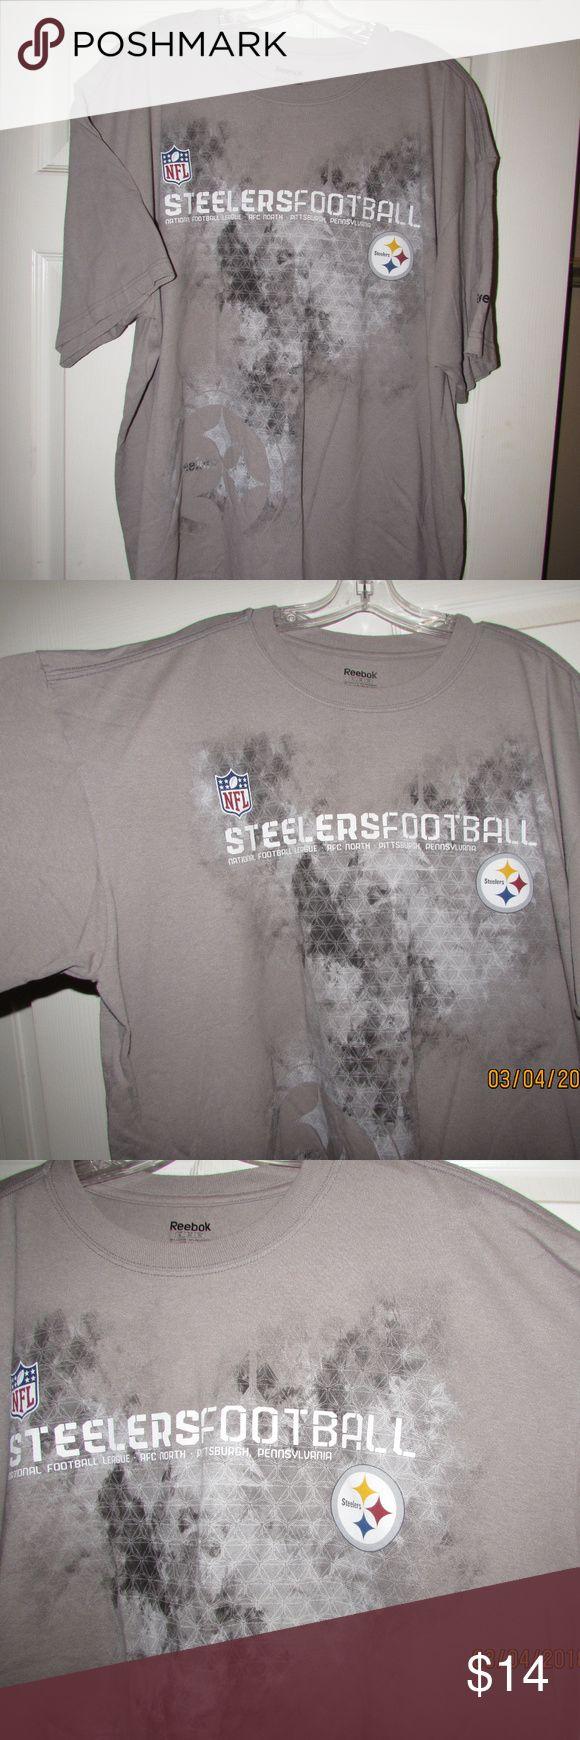 PITTSBURGH STEELERS NFL Reebok XL Tee T-Shirt Gray PITTSBURGH STEELERS NFL Reebok Size XL Tee T-Shirt Gray Reebok Shirts Tees - Short Sleeve